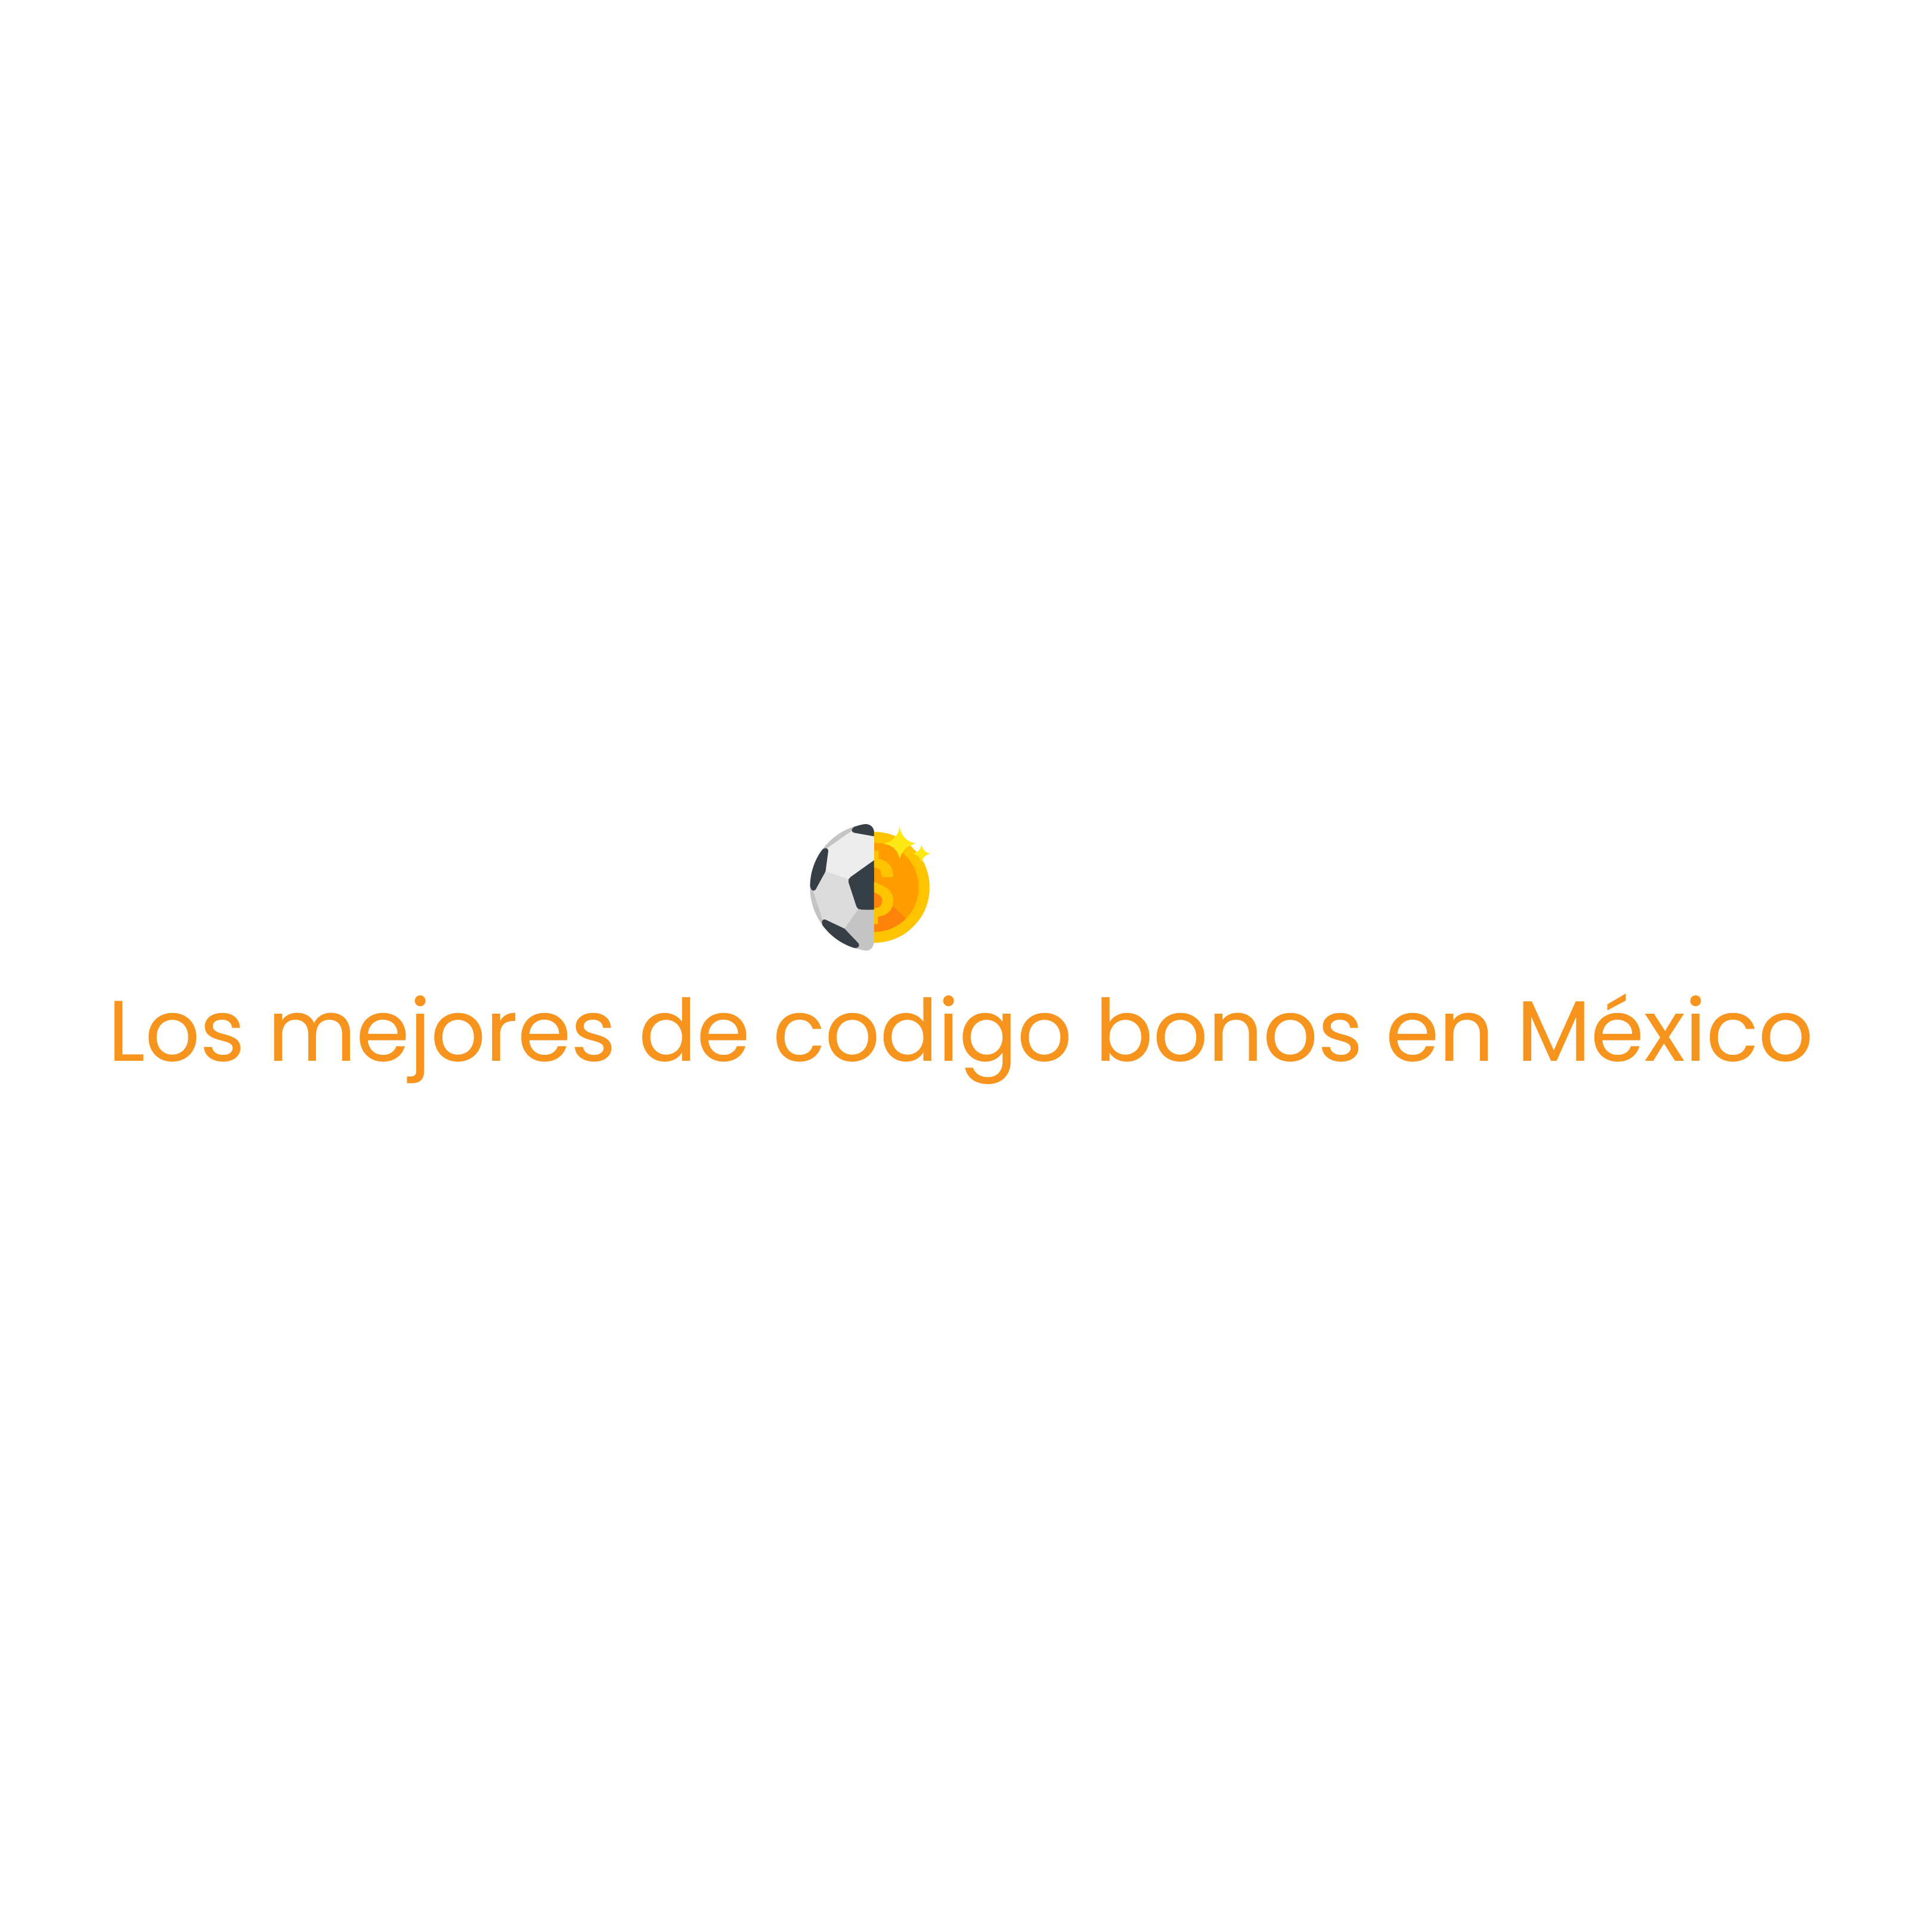 codigobonusmexico